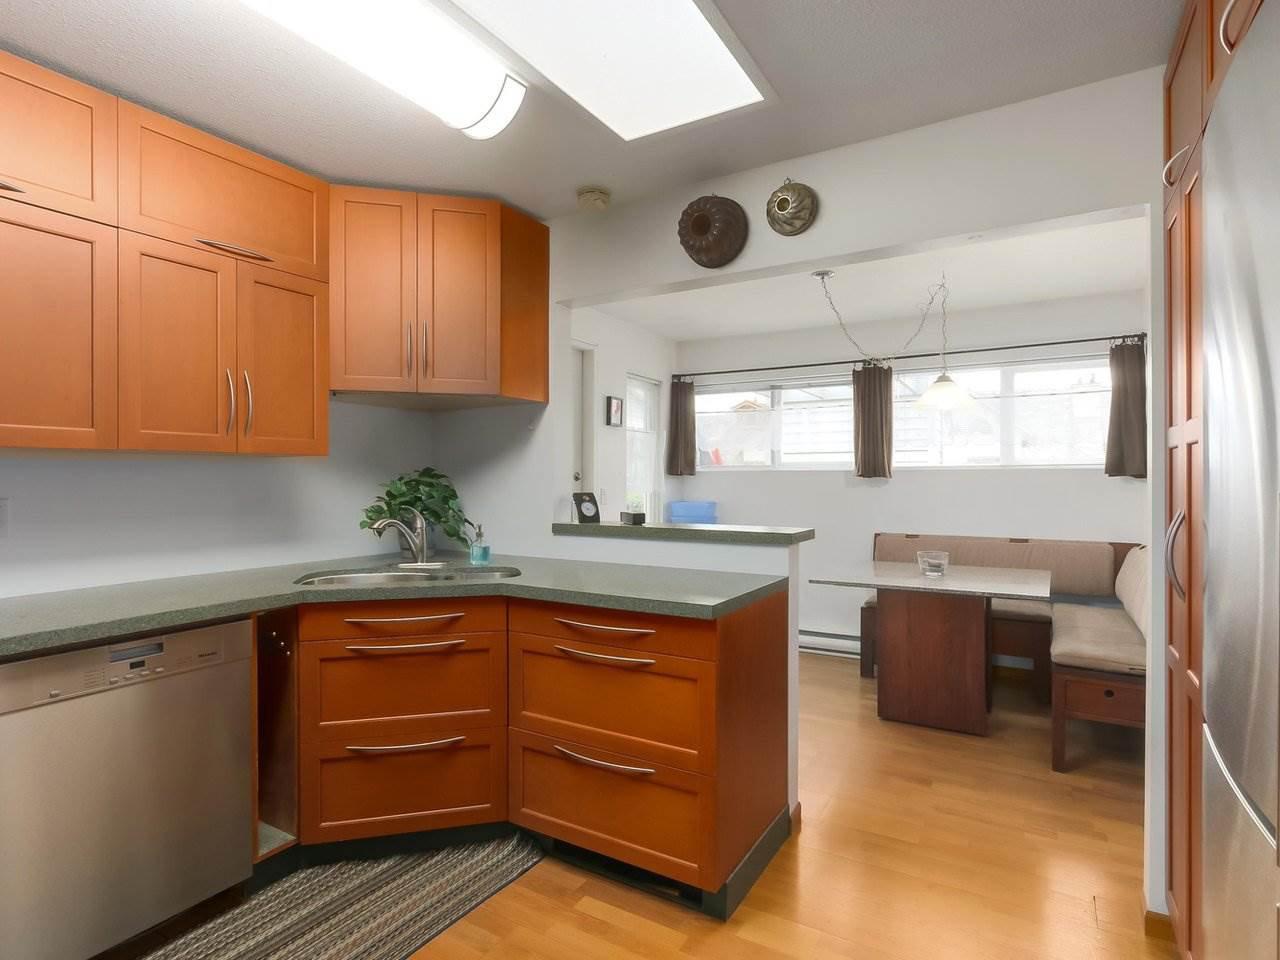 Photo 10: Photos: 311 4989 47 AVENUE in Delta: Ladner Elementary Condo for sale (Ladner)  : MLS®# R2421936